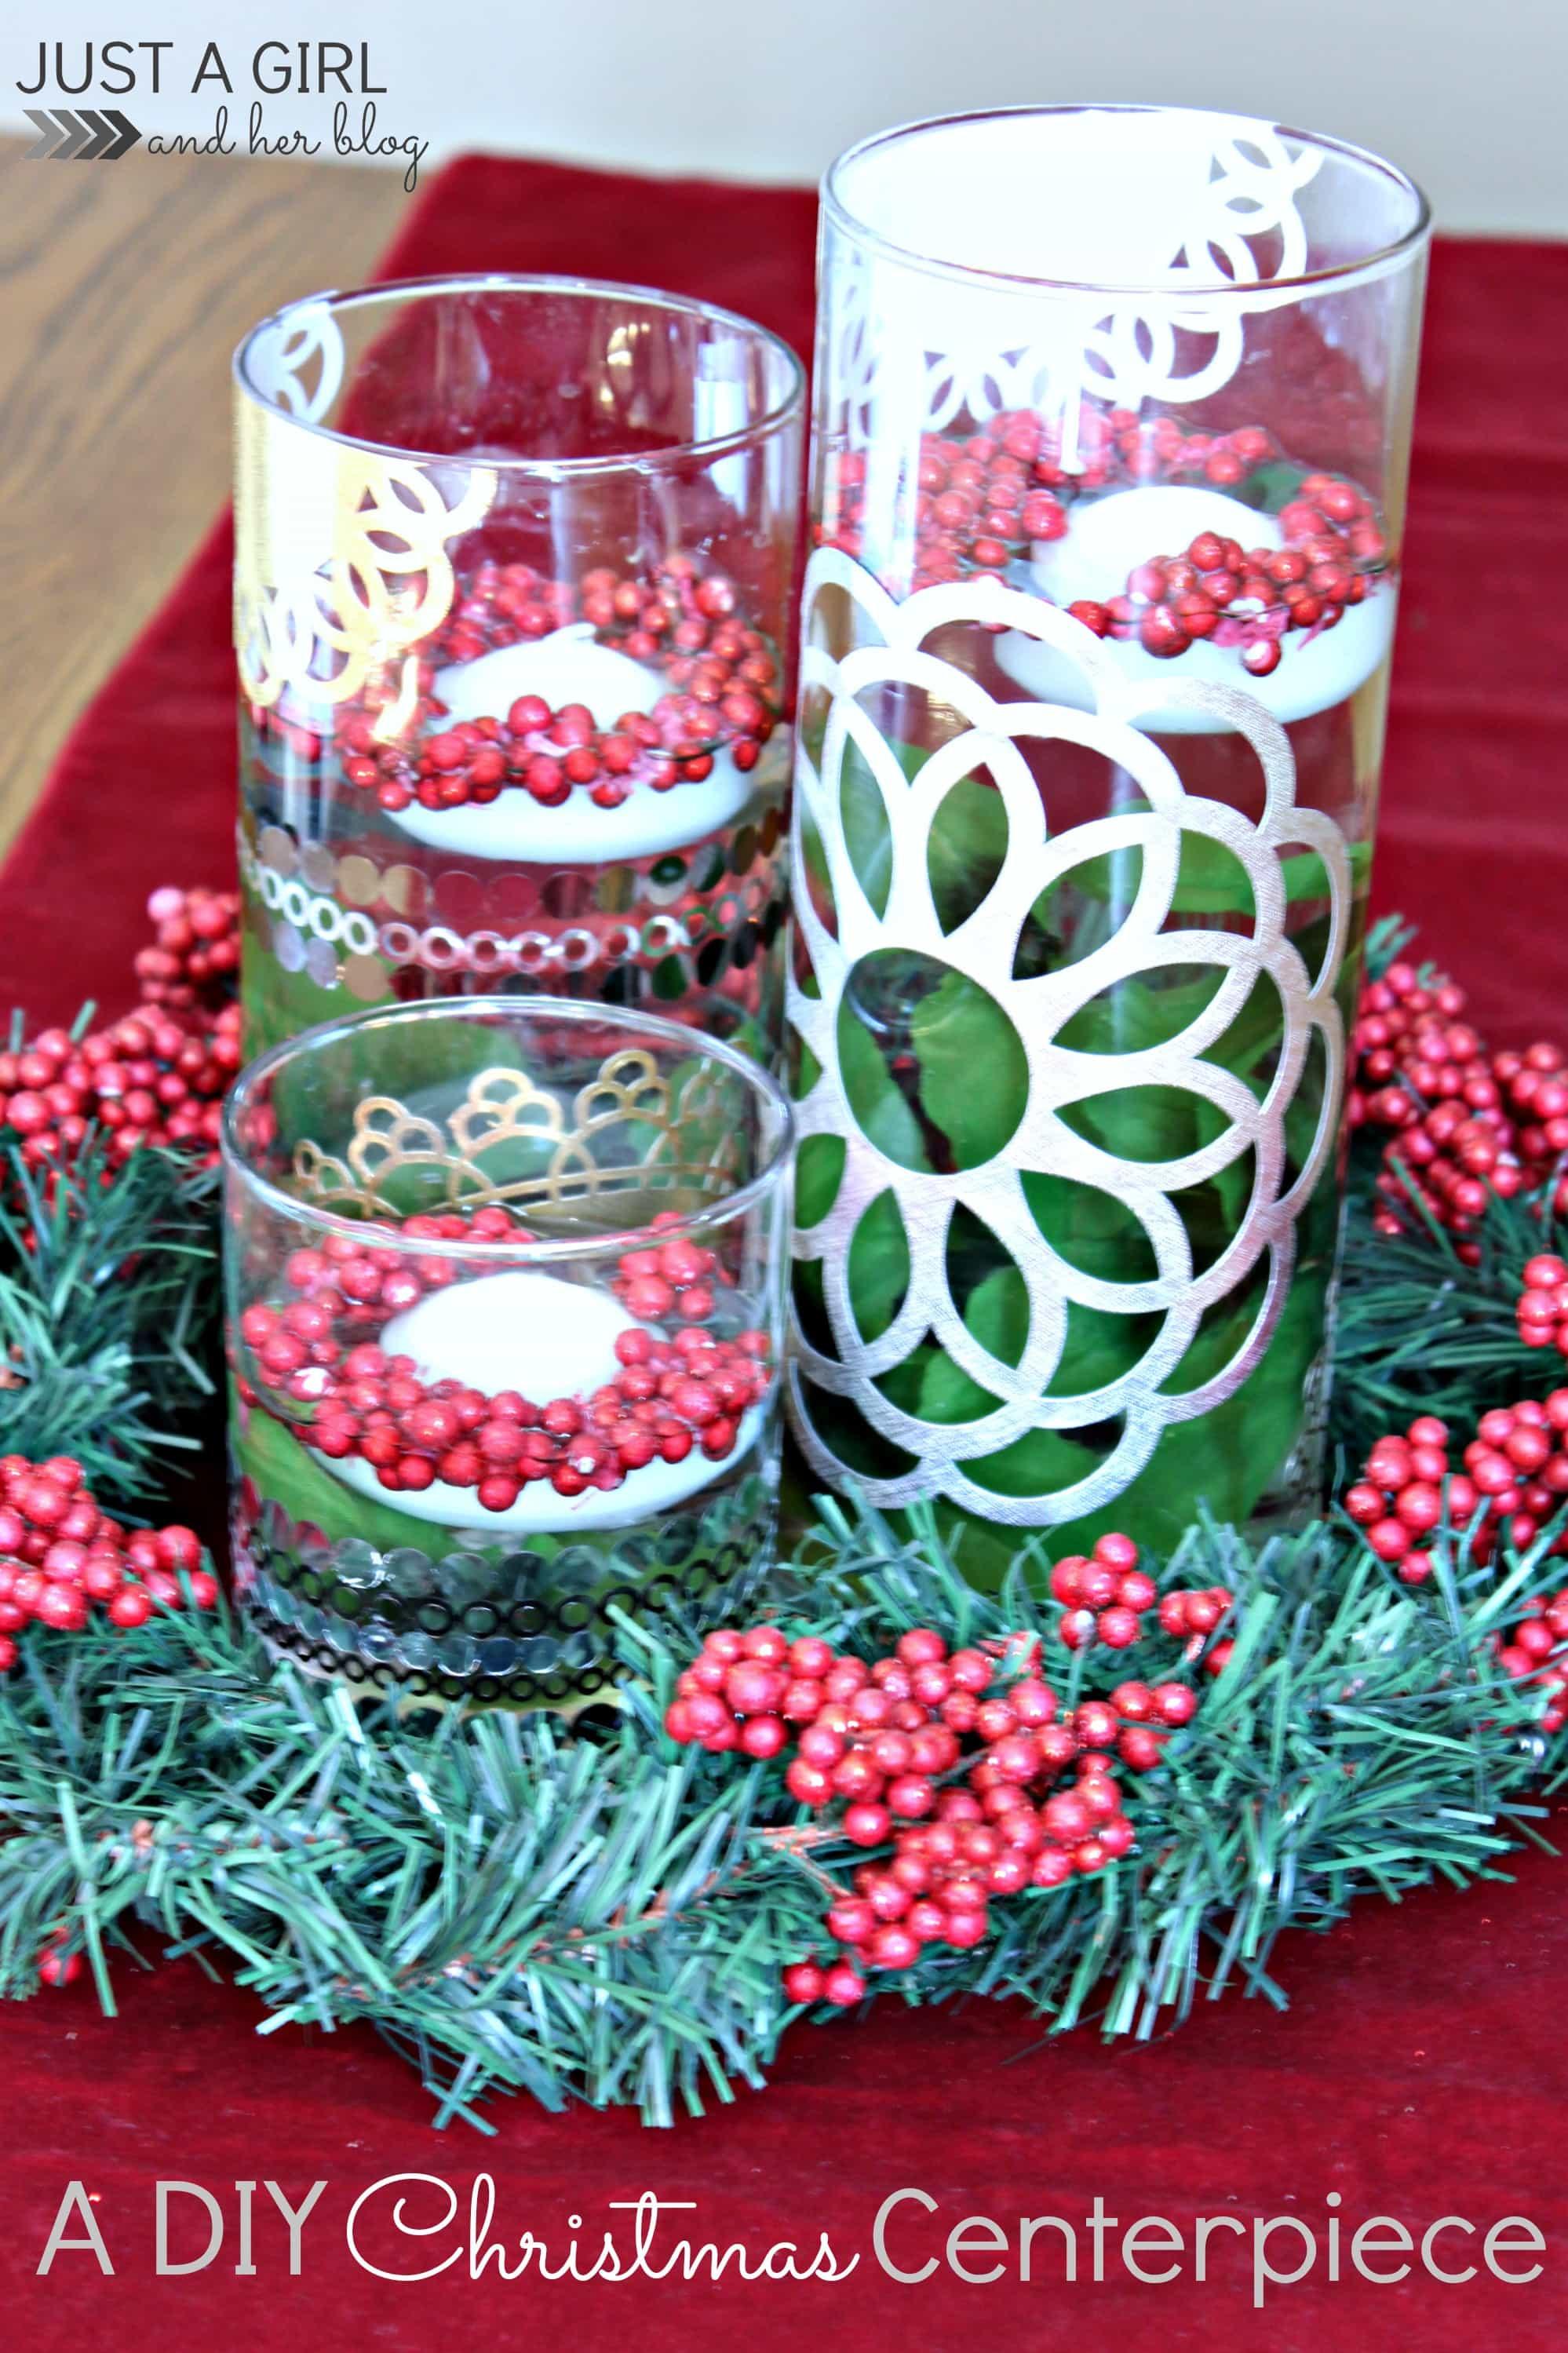 Best ideas about Christmas Centerpieces DIY . Save or Pin A DIY Christmas Centerpiece with Martha Stewart Crafts Now.